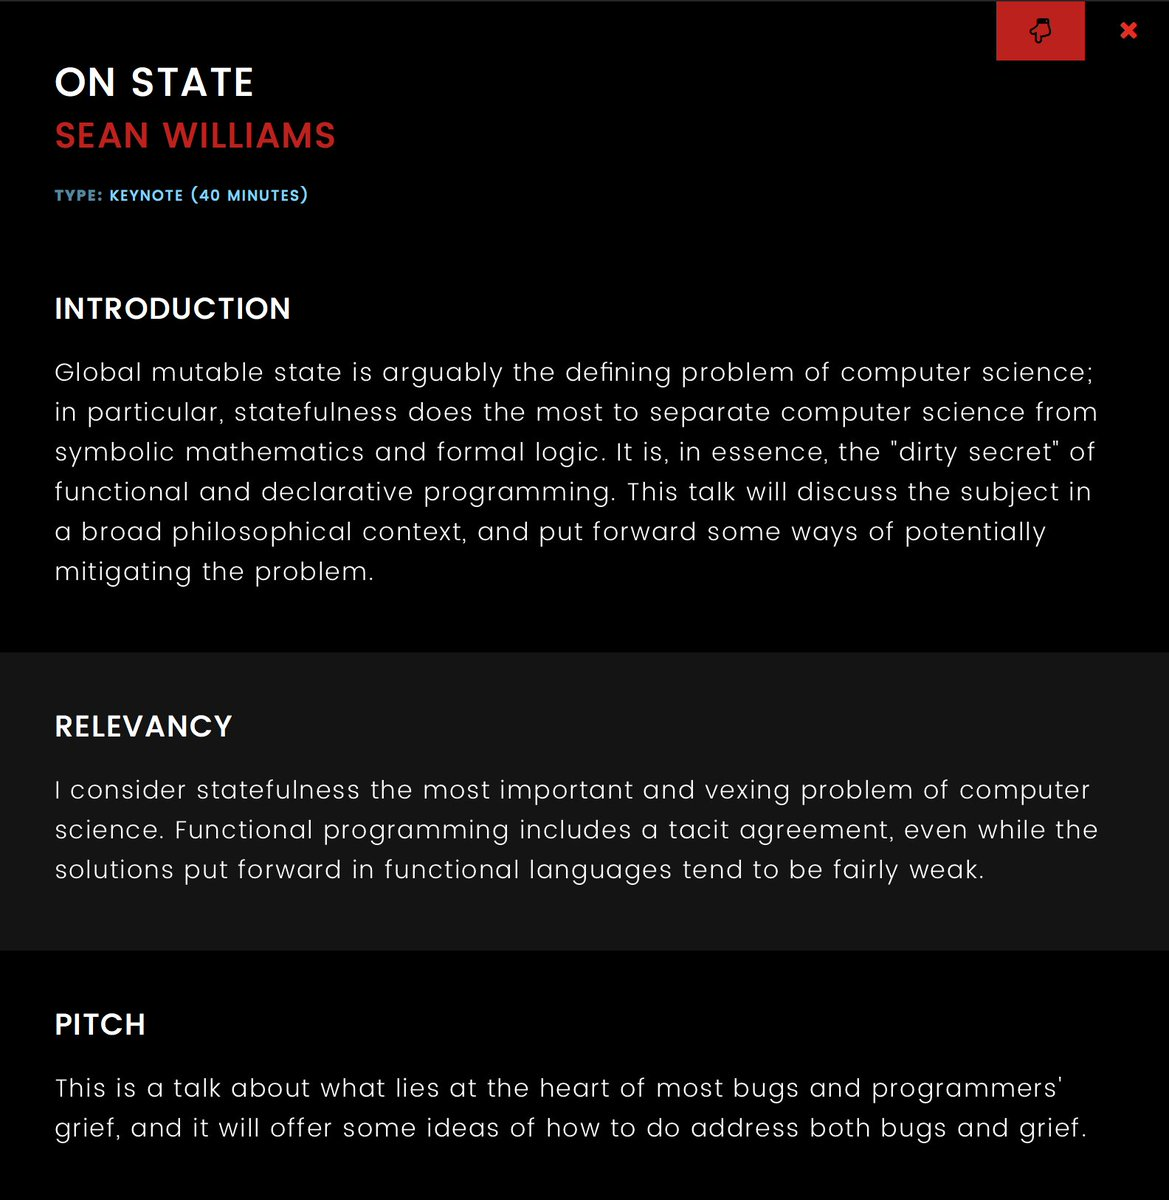 Lambdaconf On Twitter Lambdaconf 2017 Keynote On State By Sean